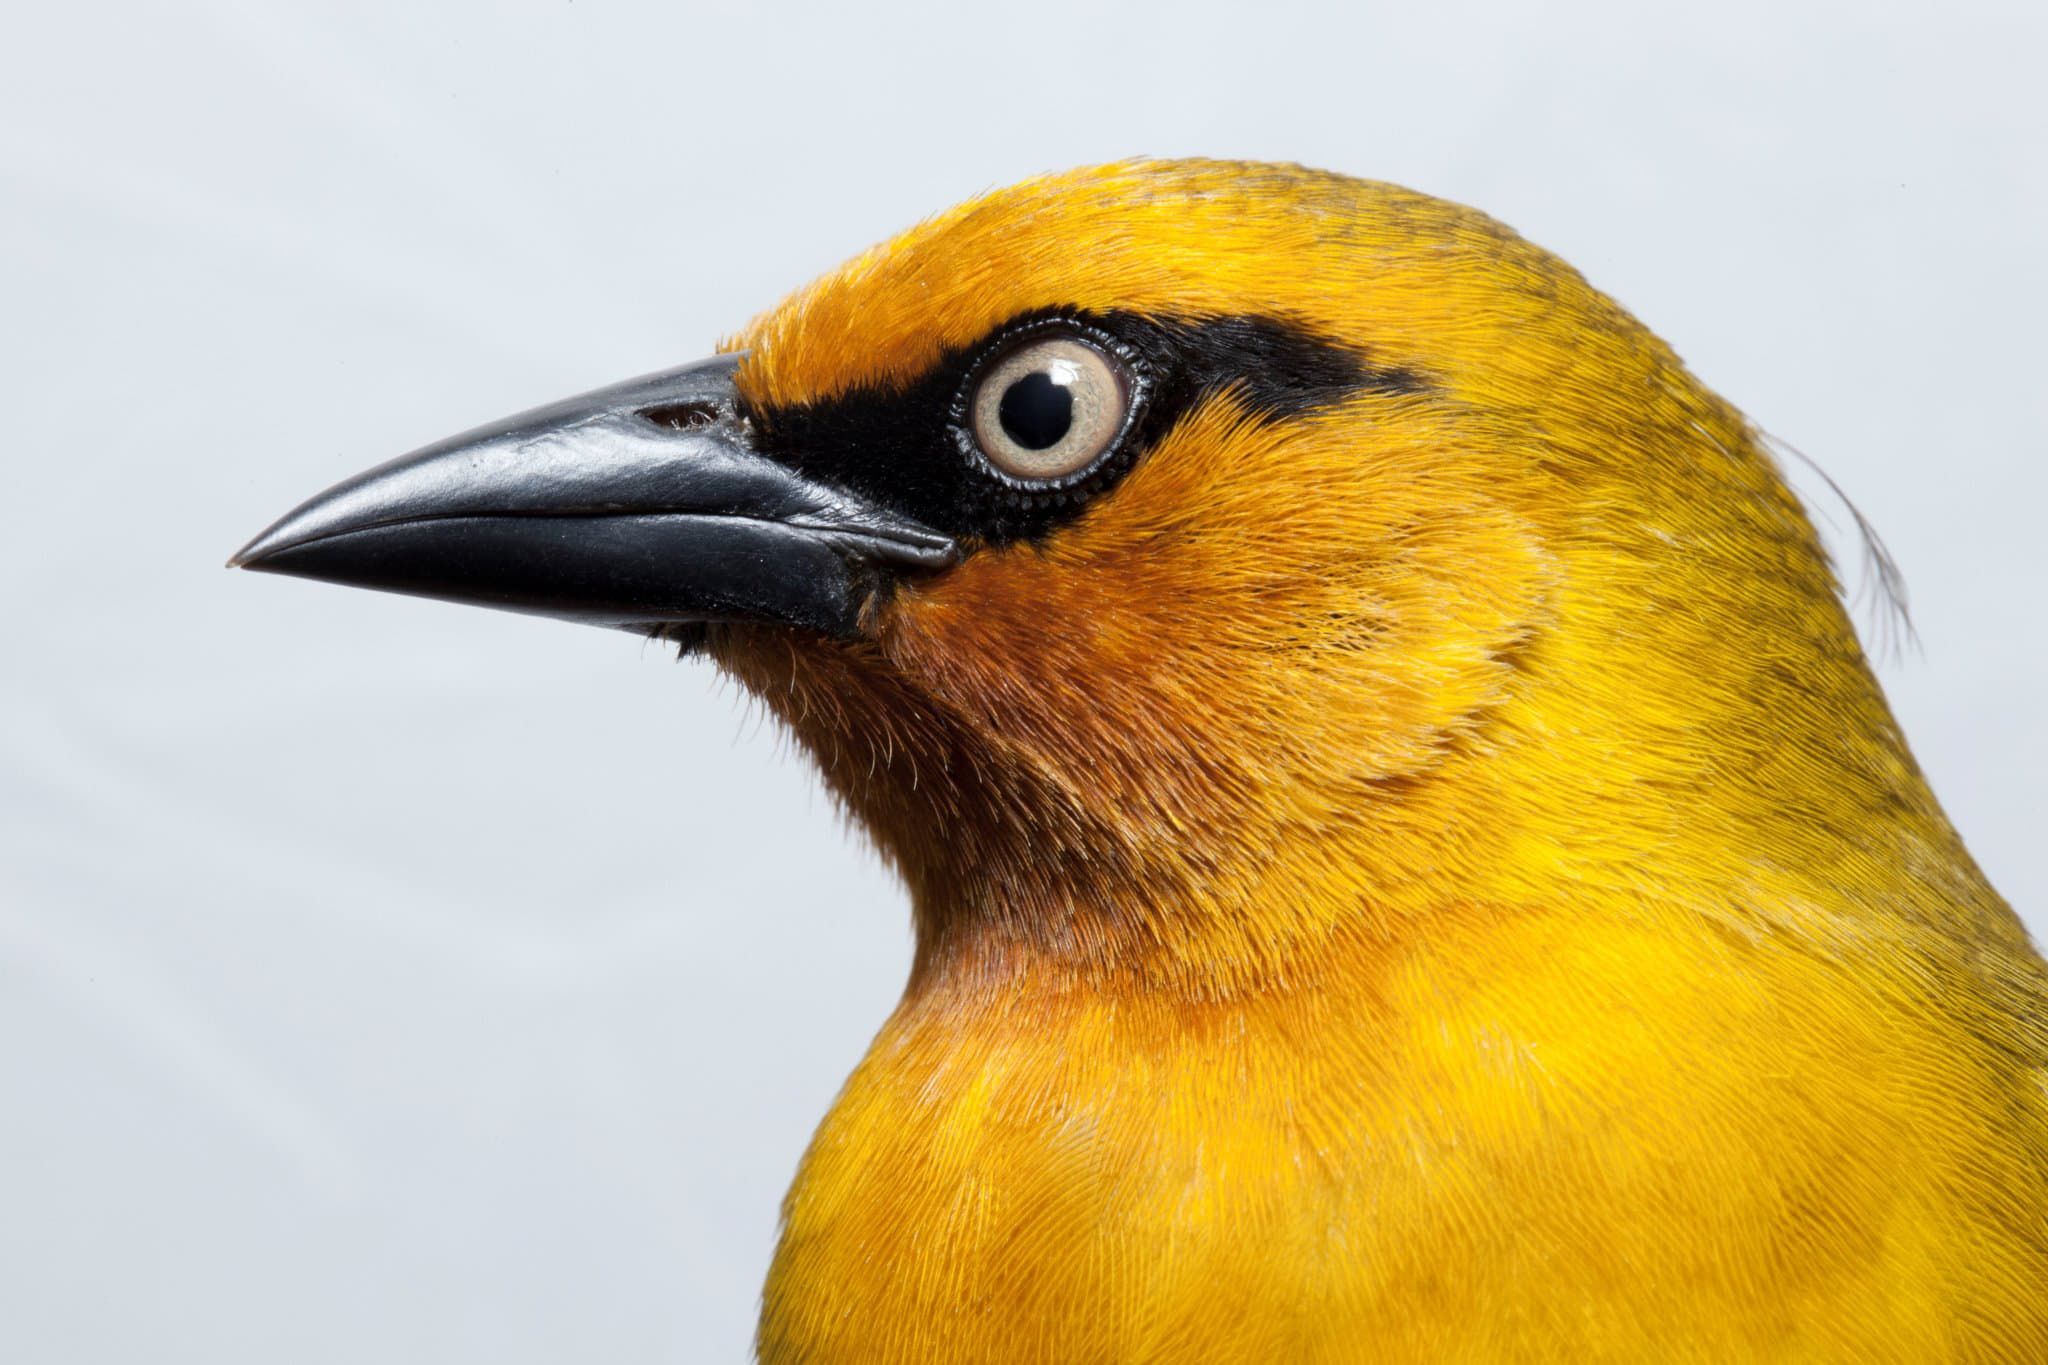 Field Museum Zoology